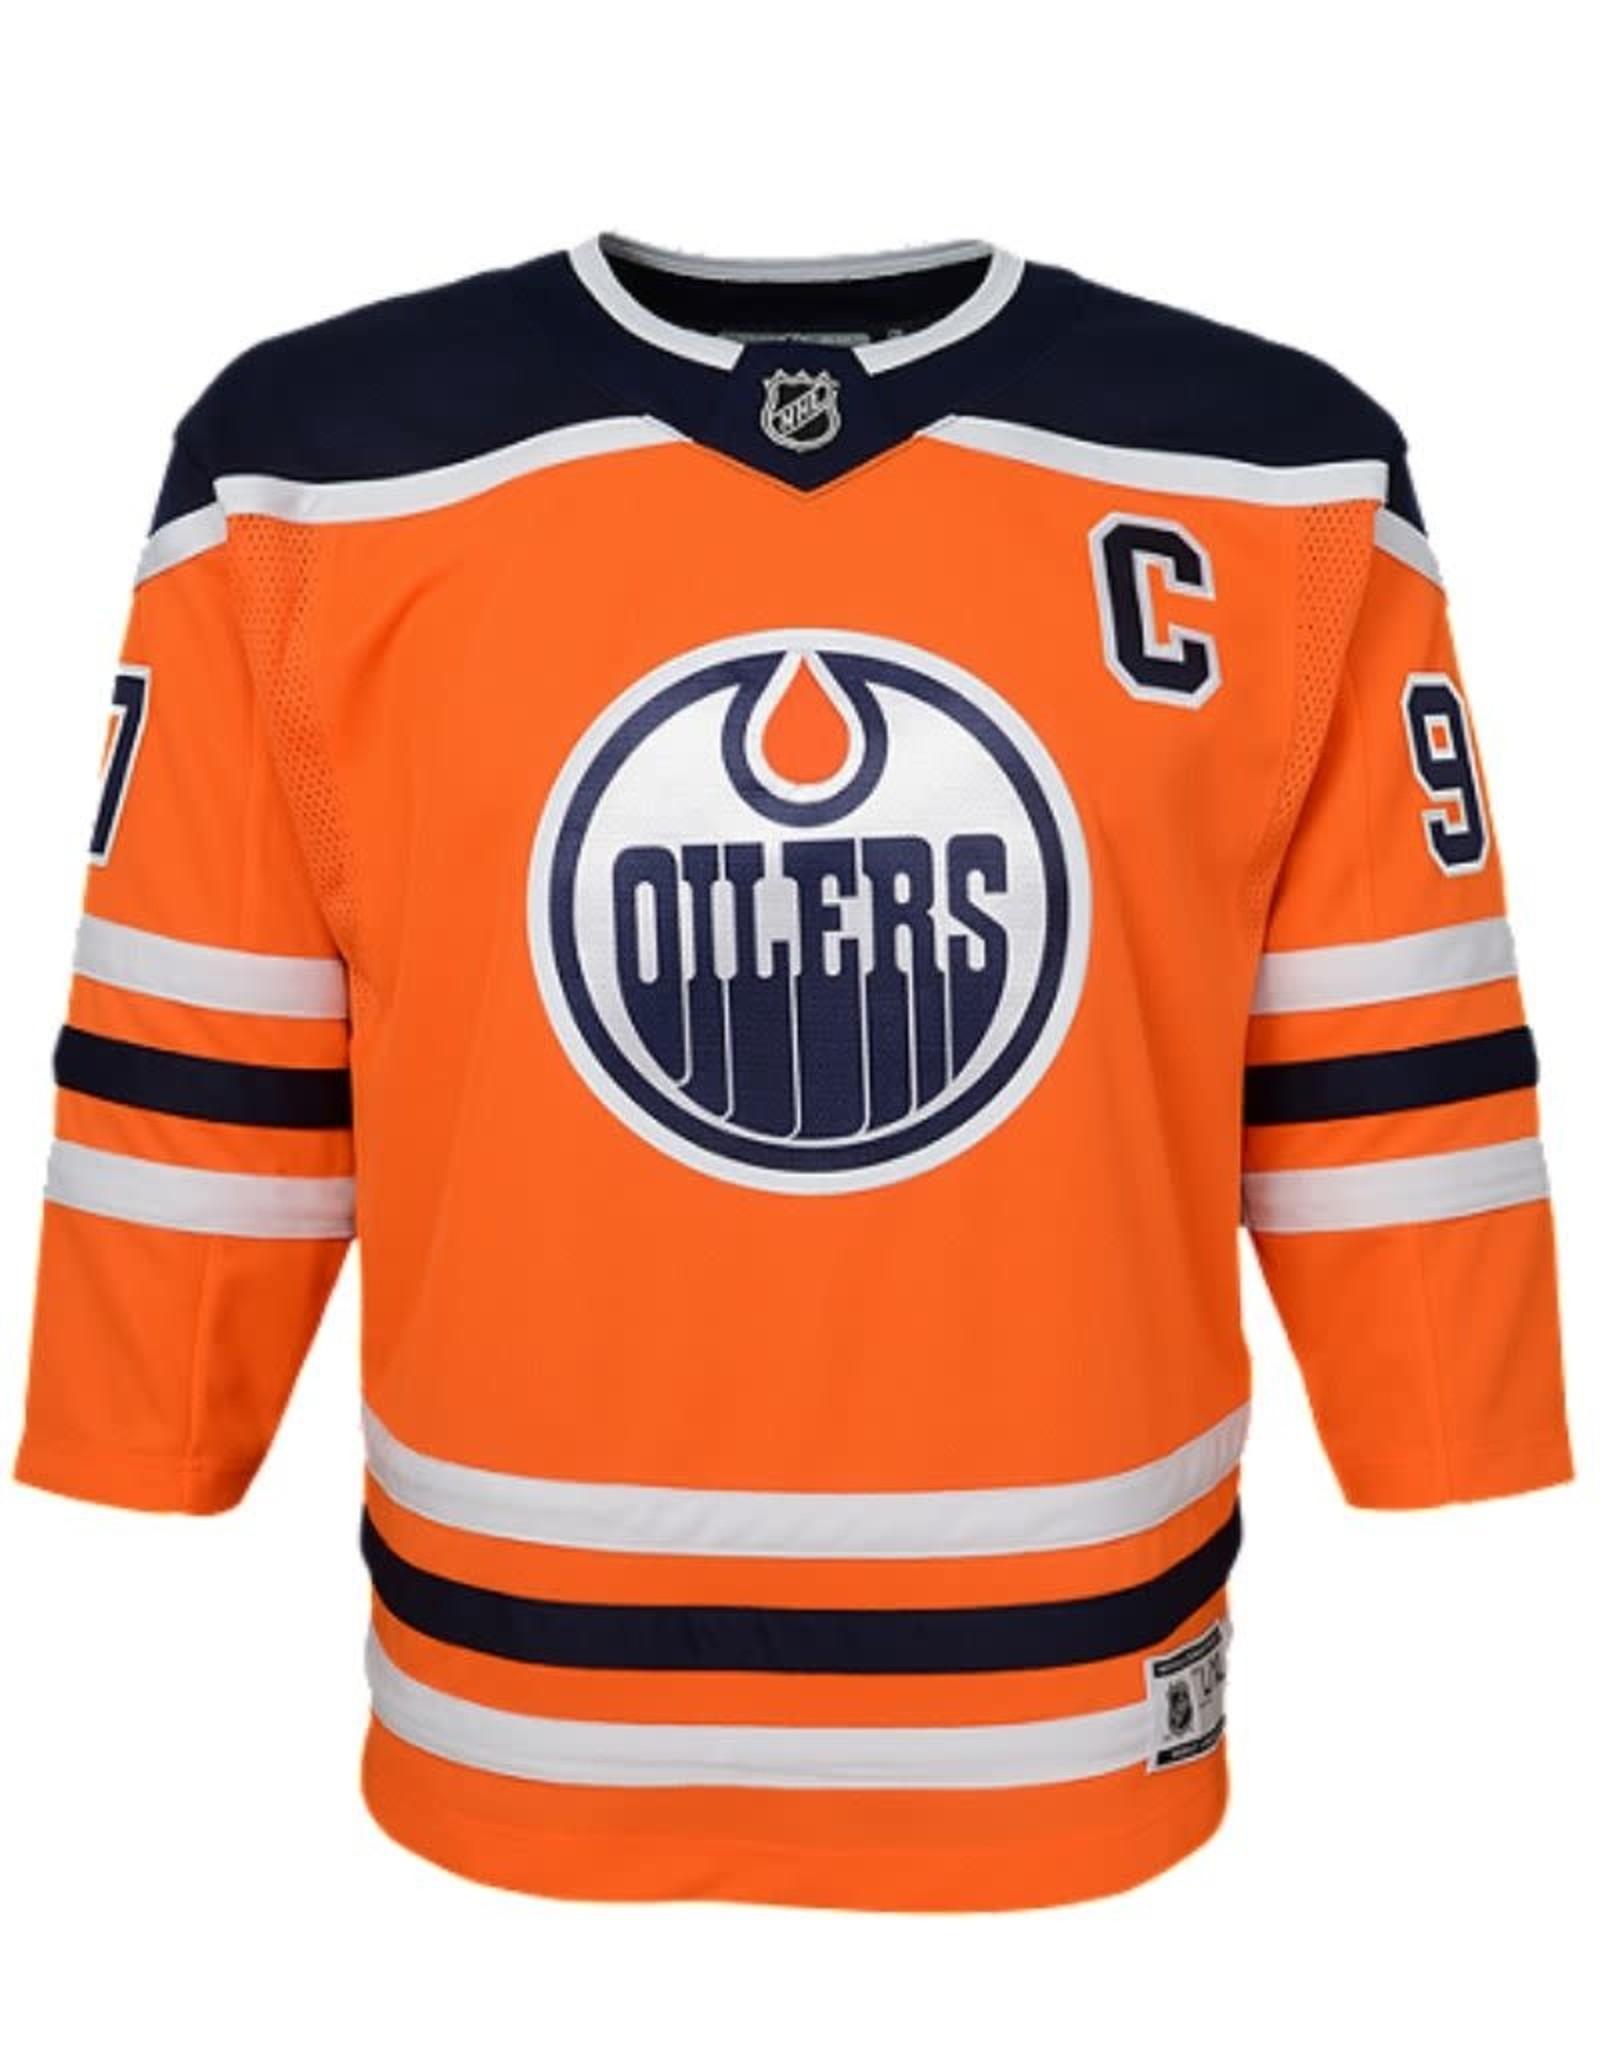 NHL Youth Premier Home Jersey McDavid #97 Edmonton Oilers Orange